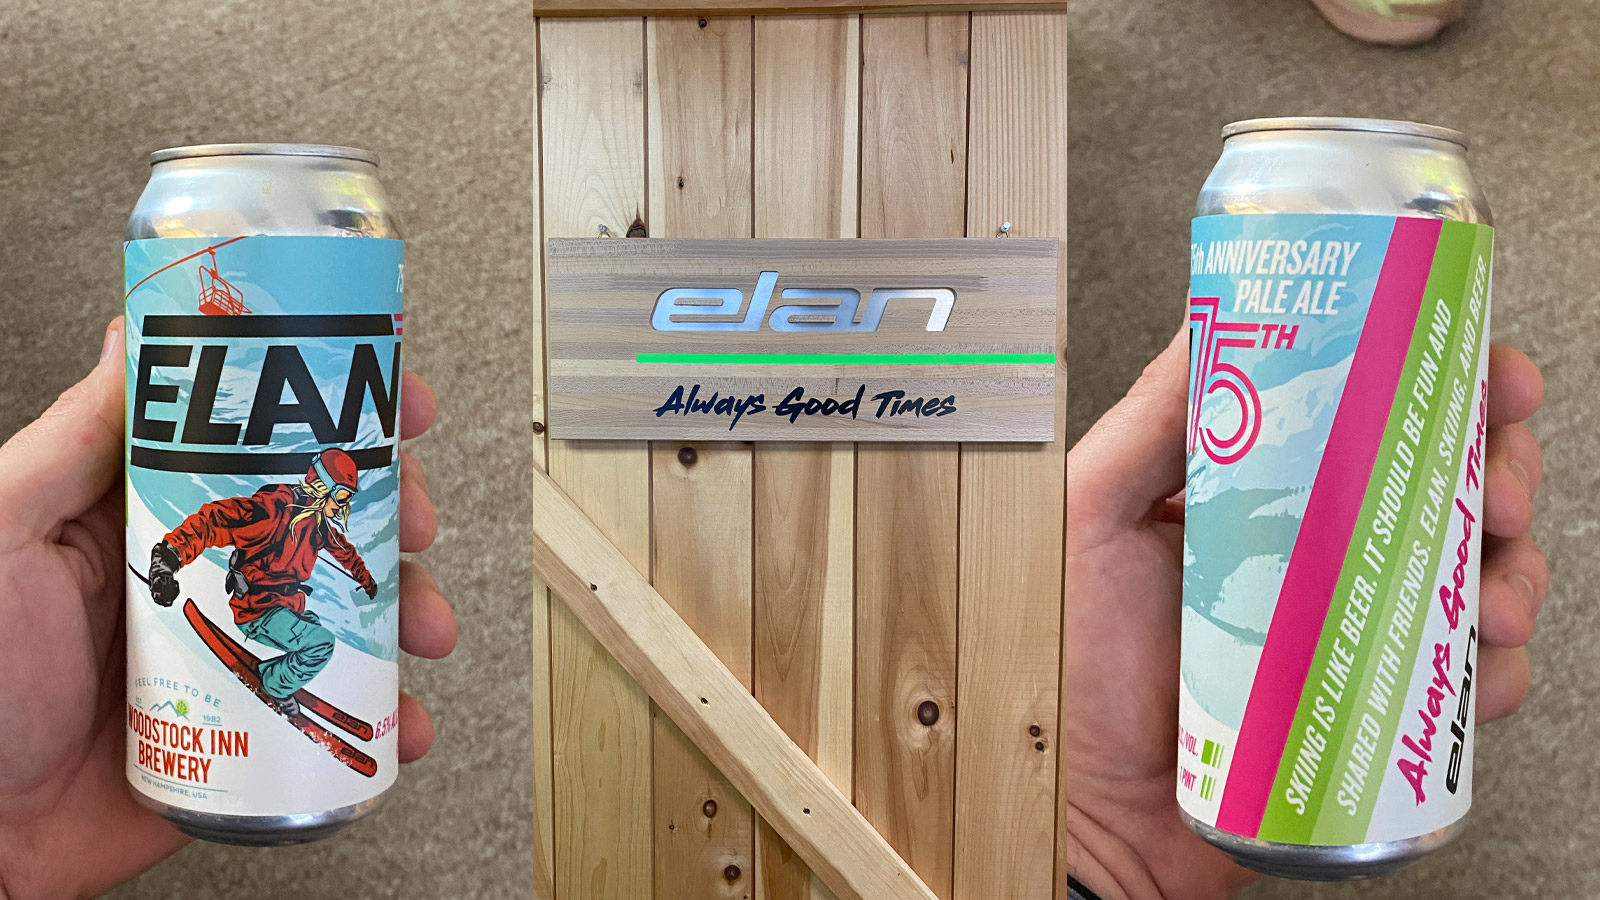 Elan, beer, apres ski, apres, craft beer, the ski monster